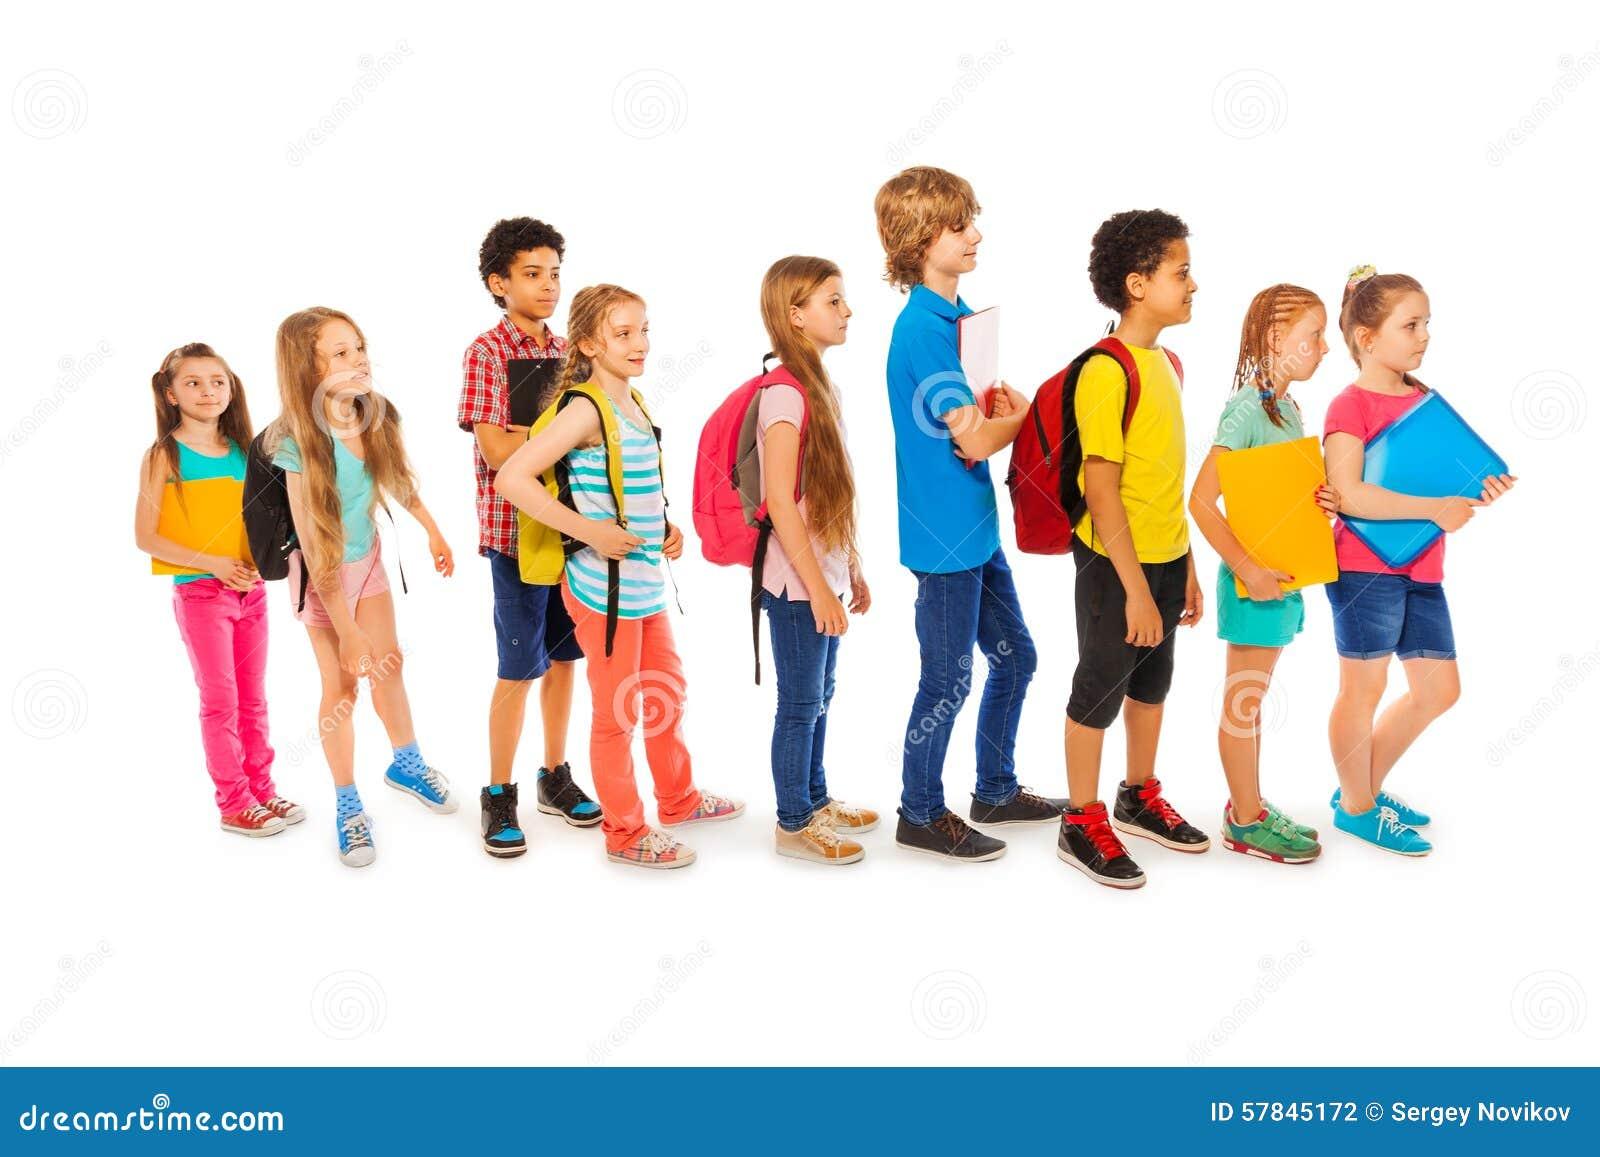 school line clipart - photo #43